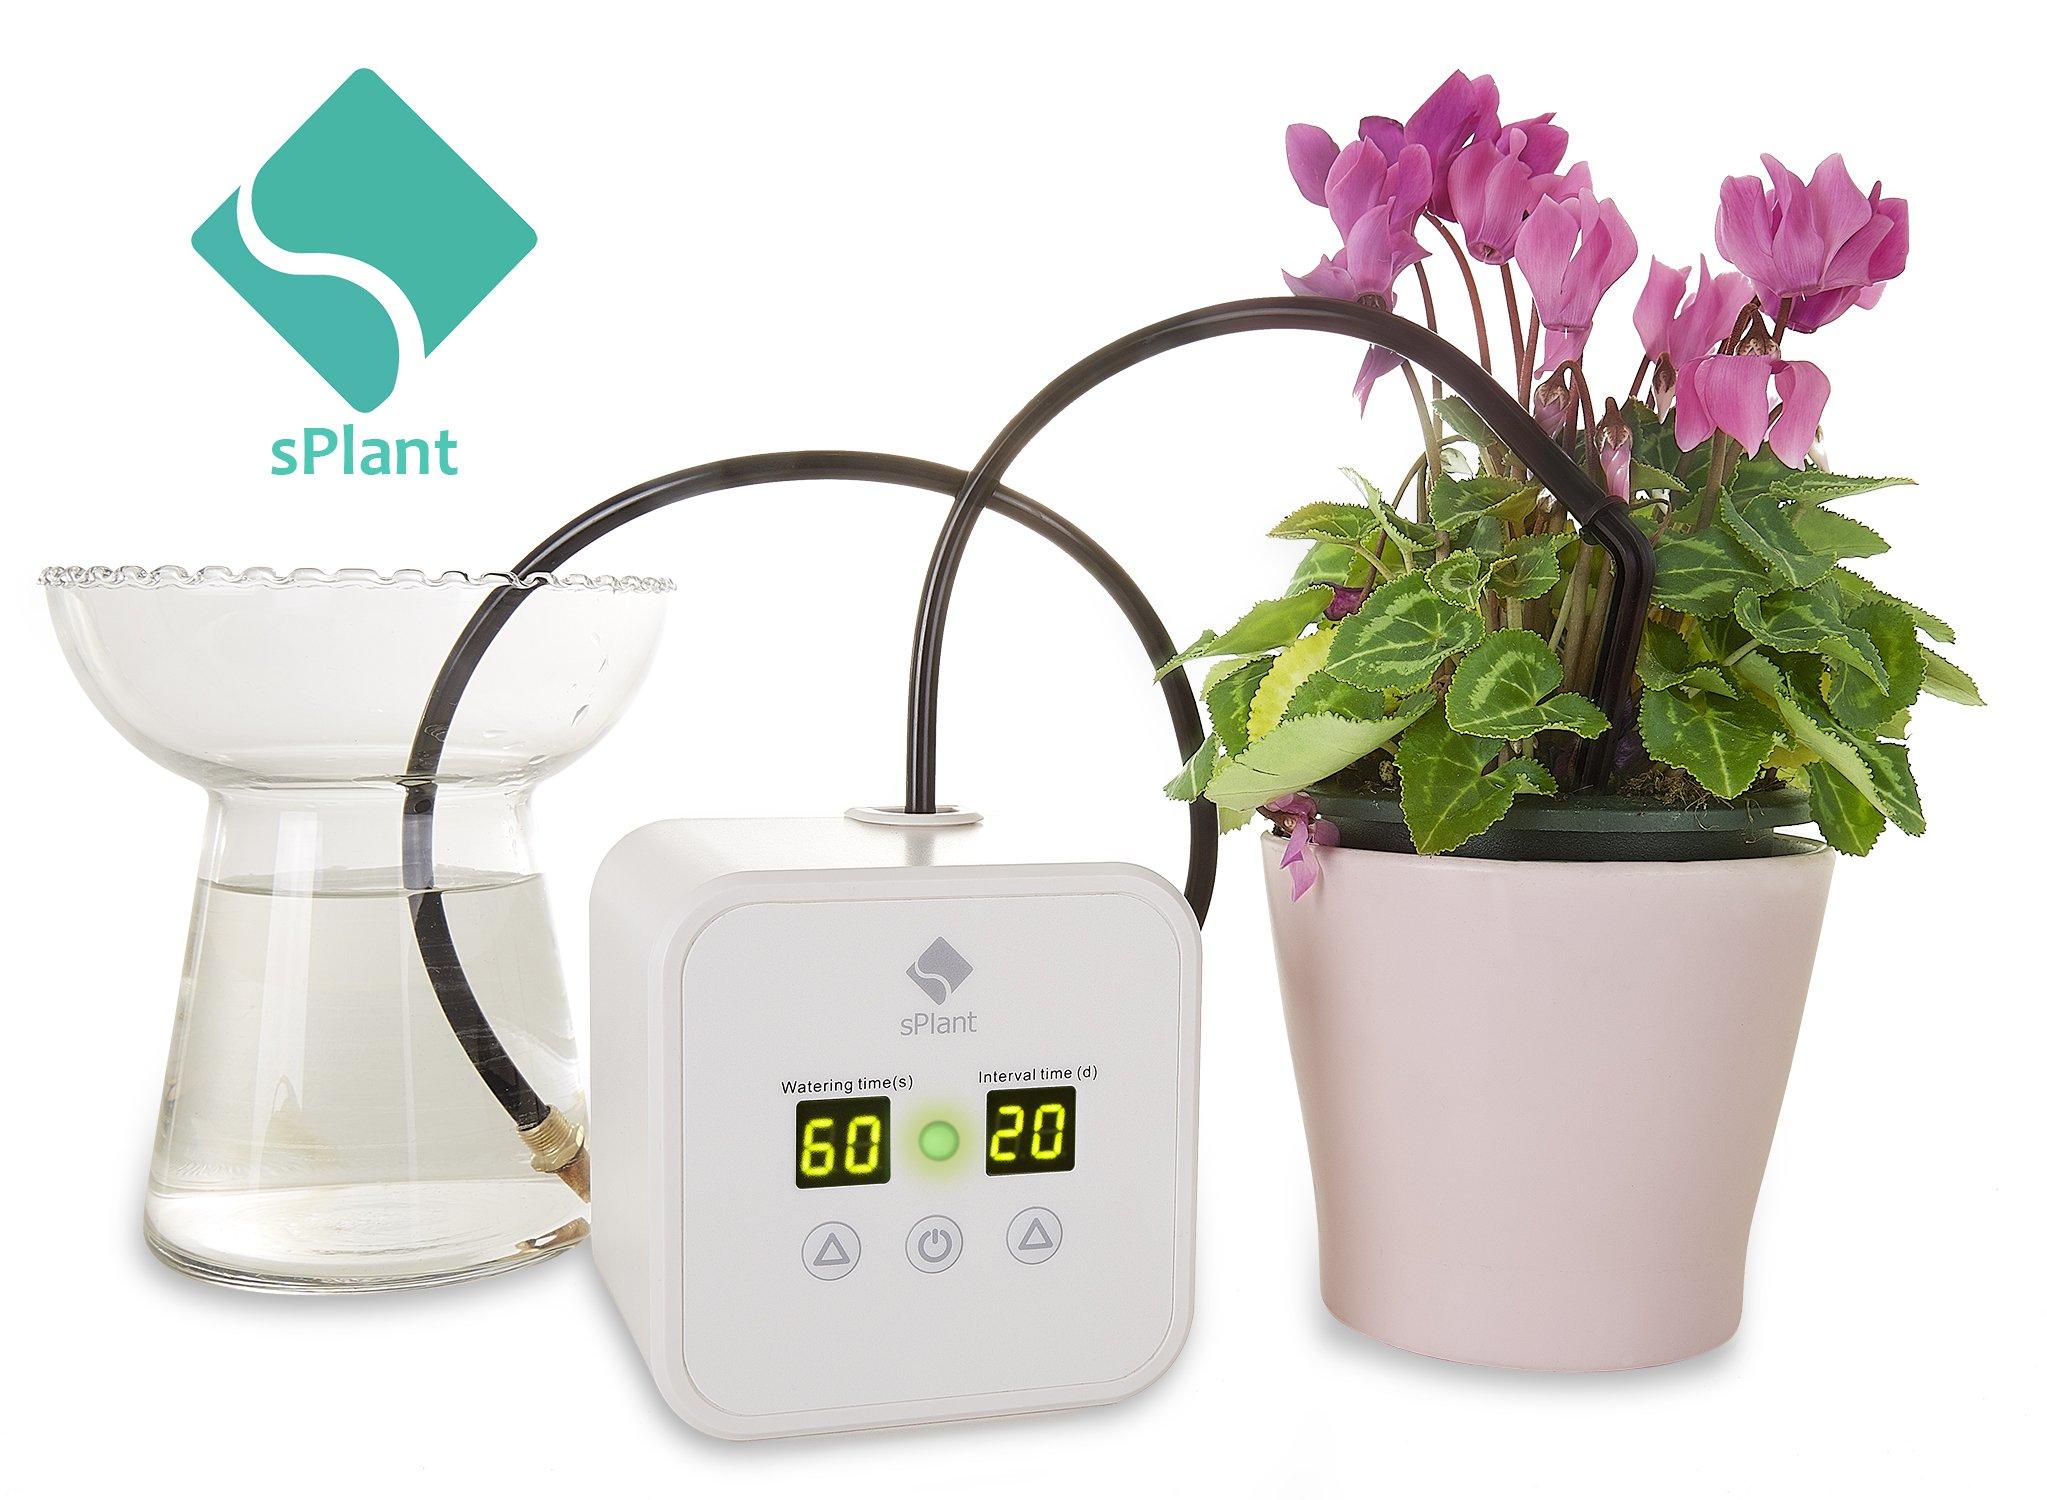 192 & Buy sPlant Drip Irrigation Kit Self Watering System Auto ...